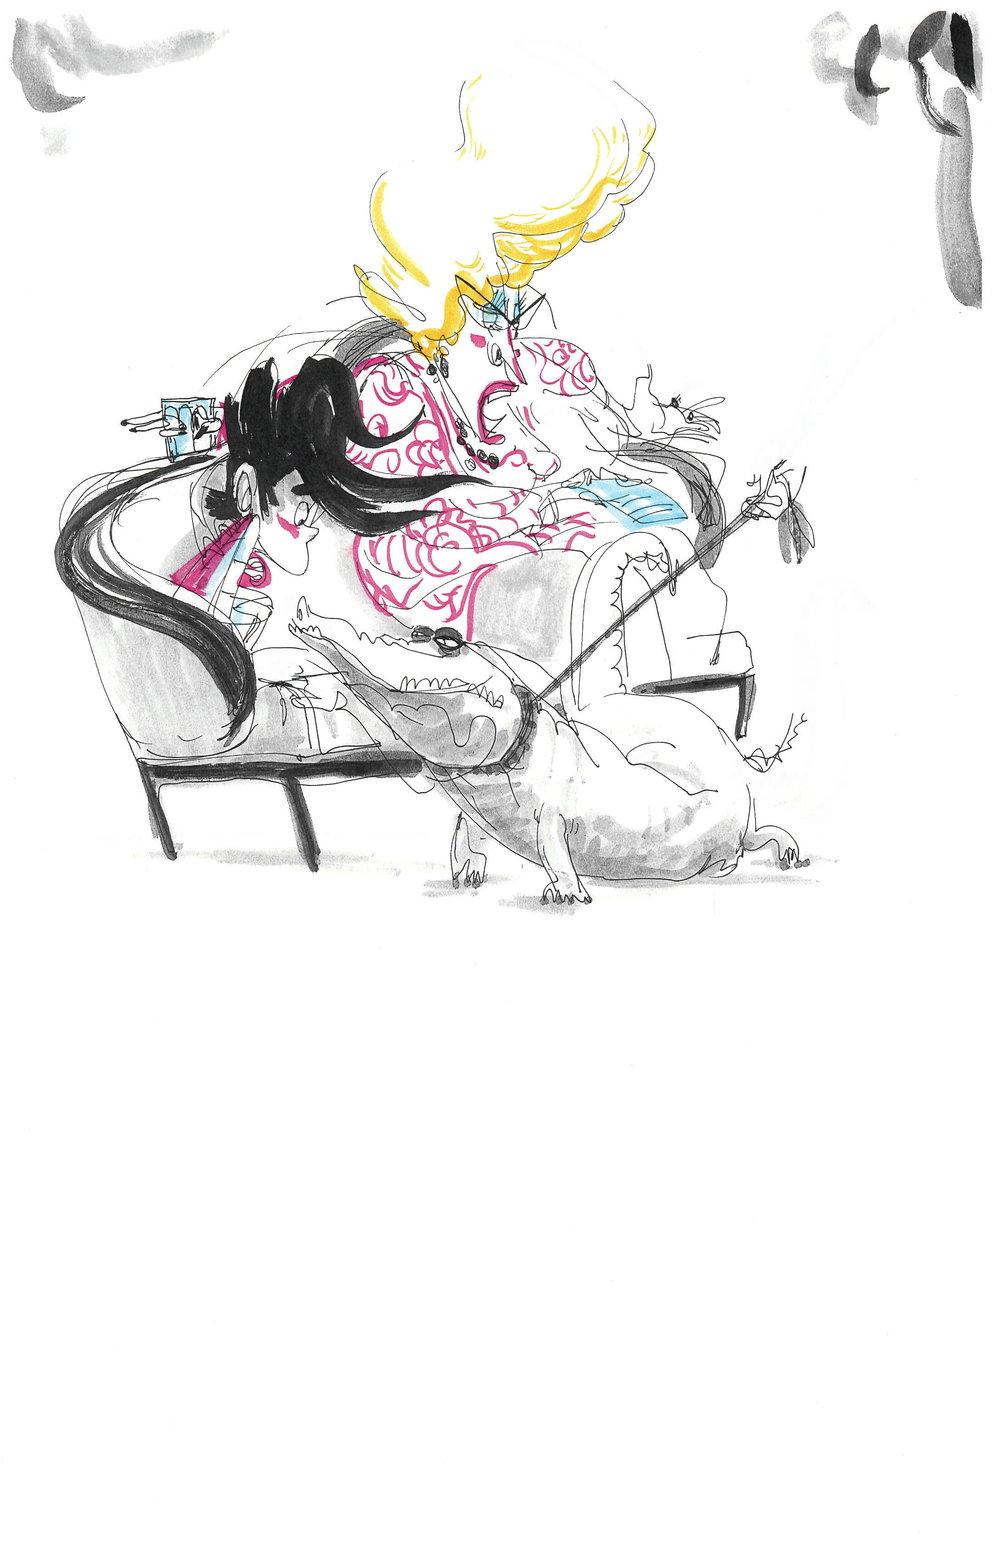 BRIANWONDERS-sketches-1_Page_05_Image_0001.jpg